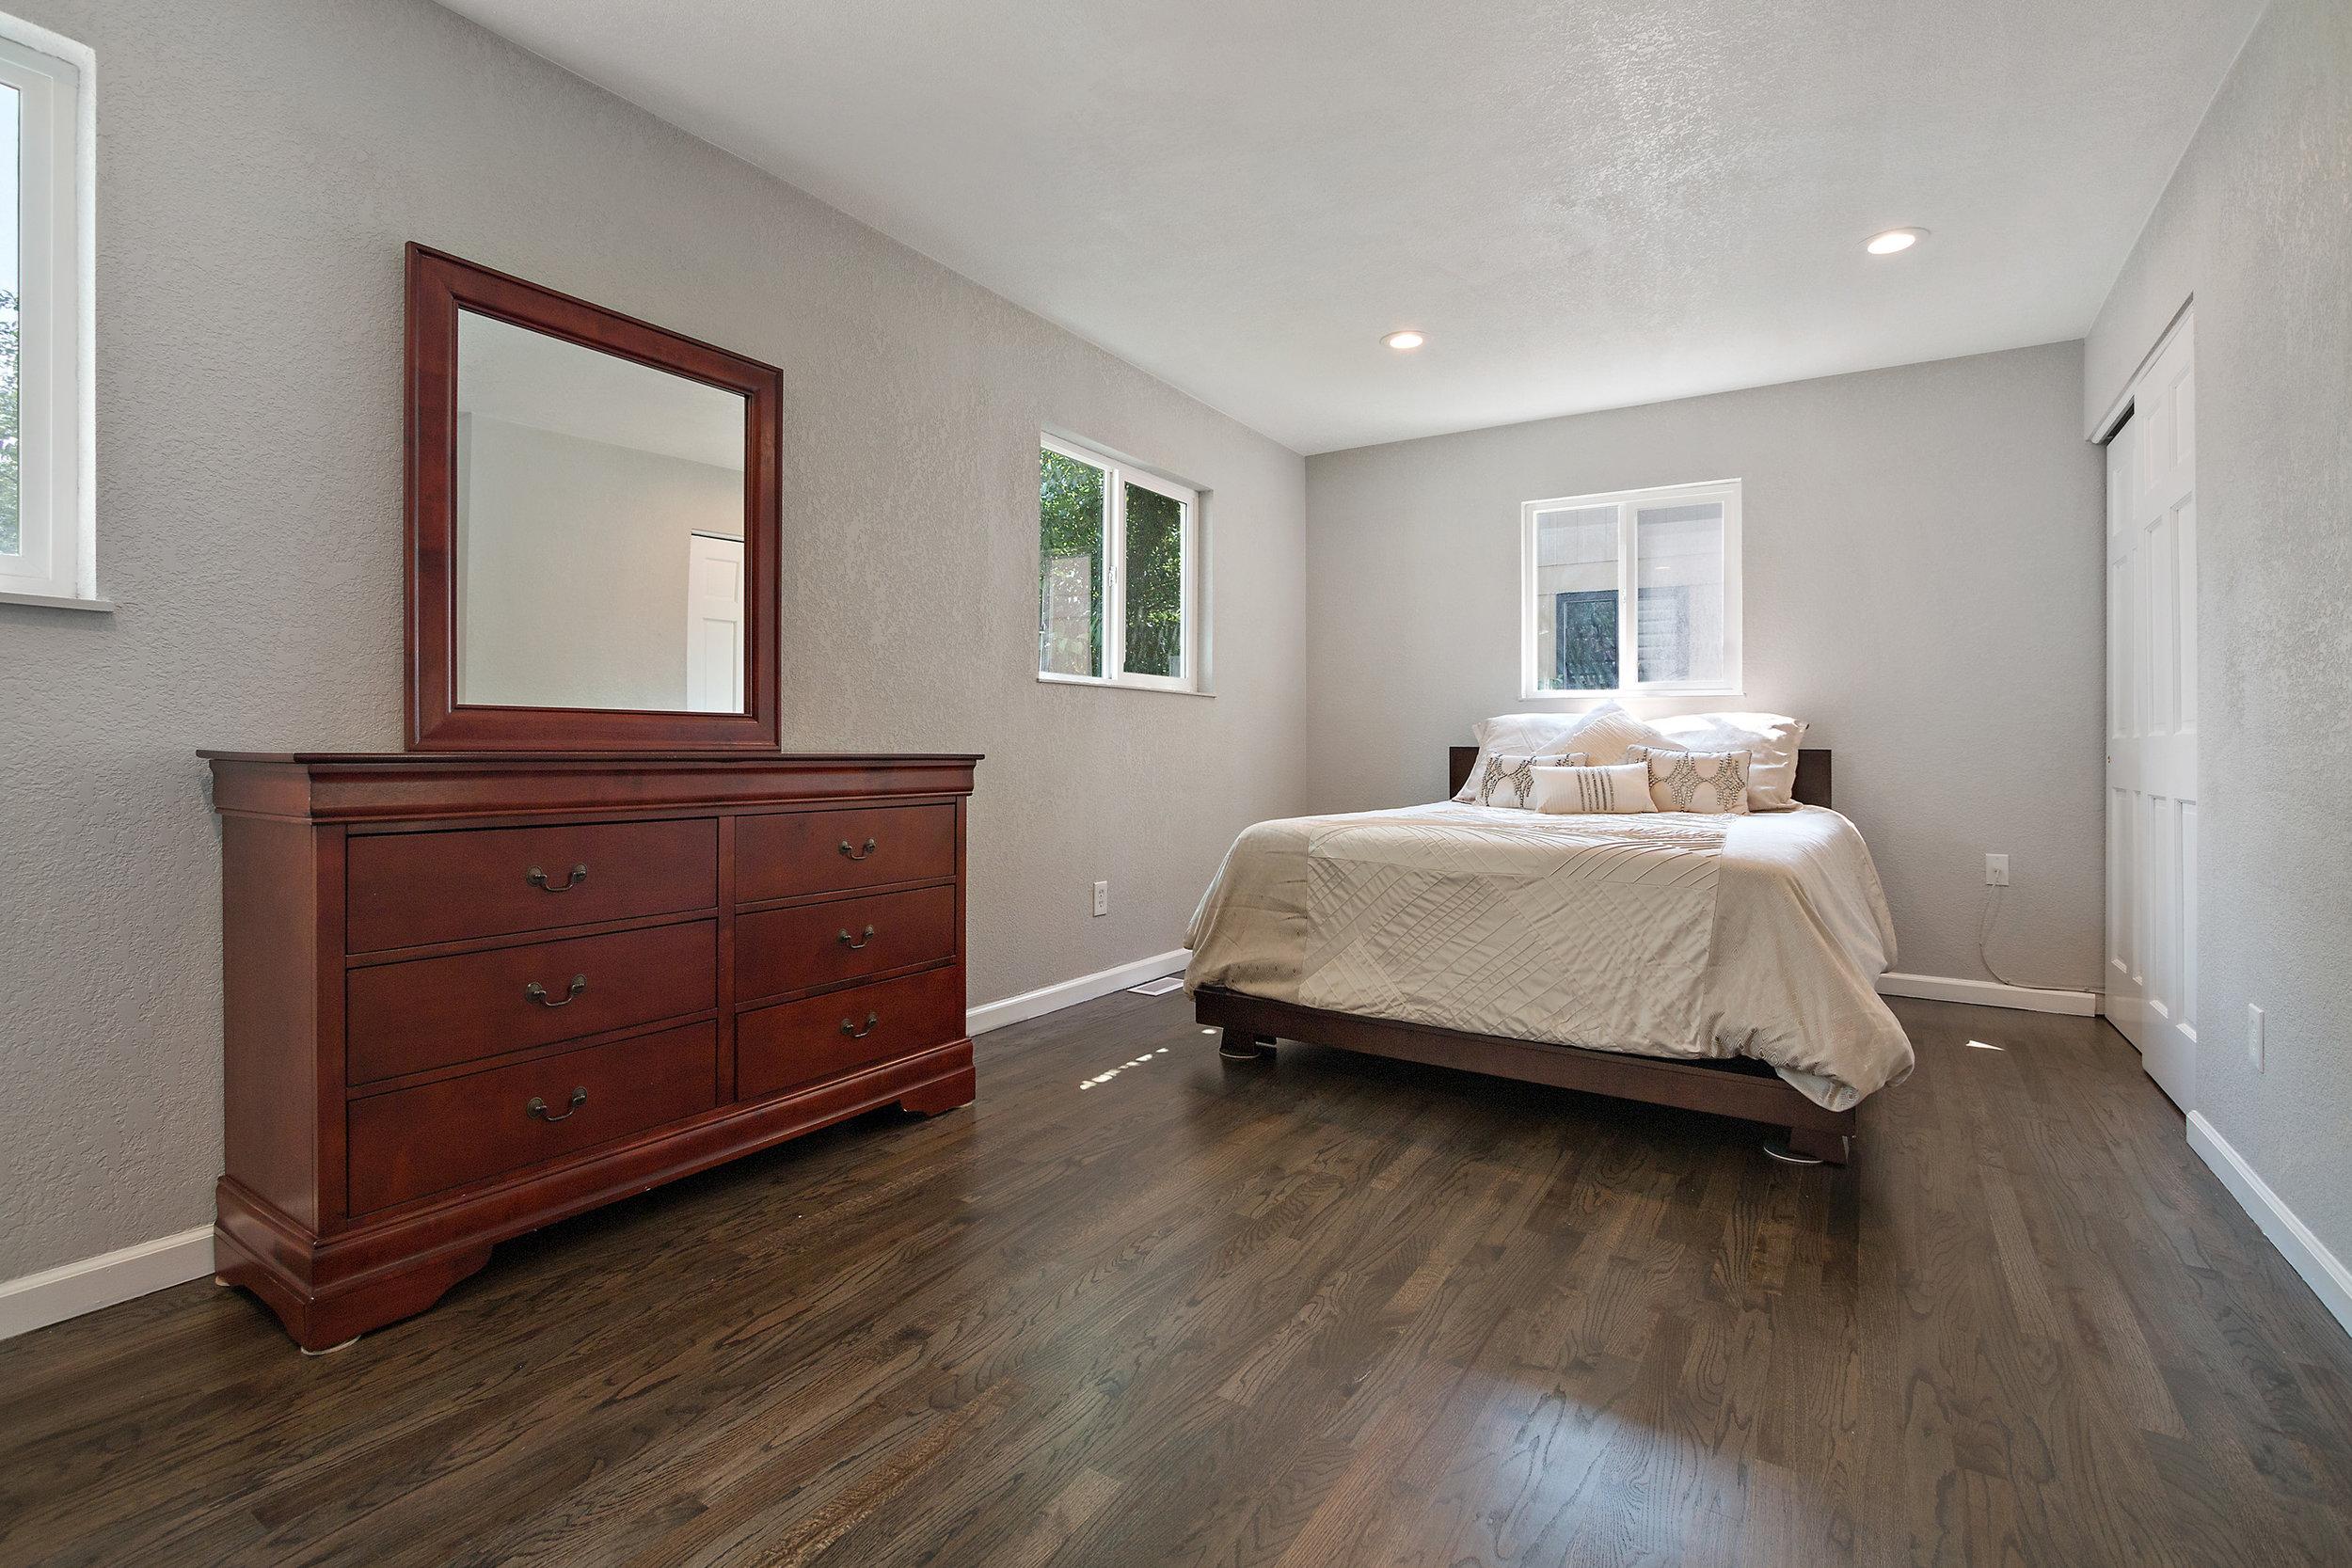 12-Bedroom 1 .jpg